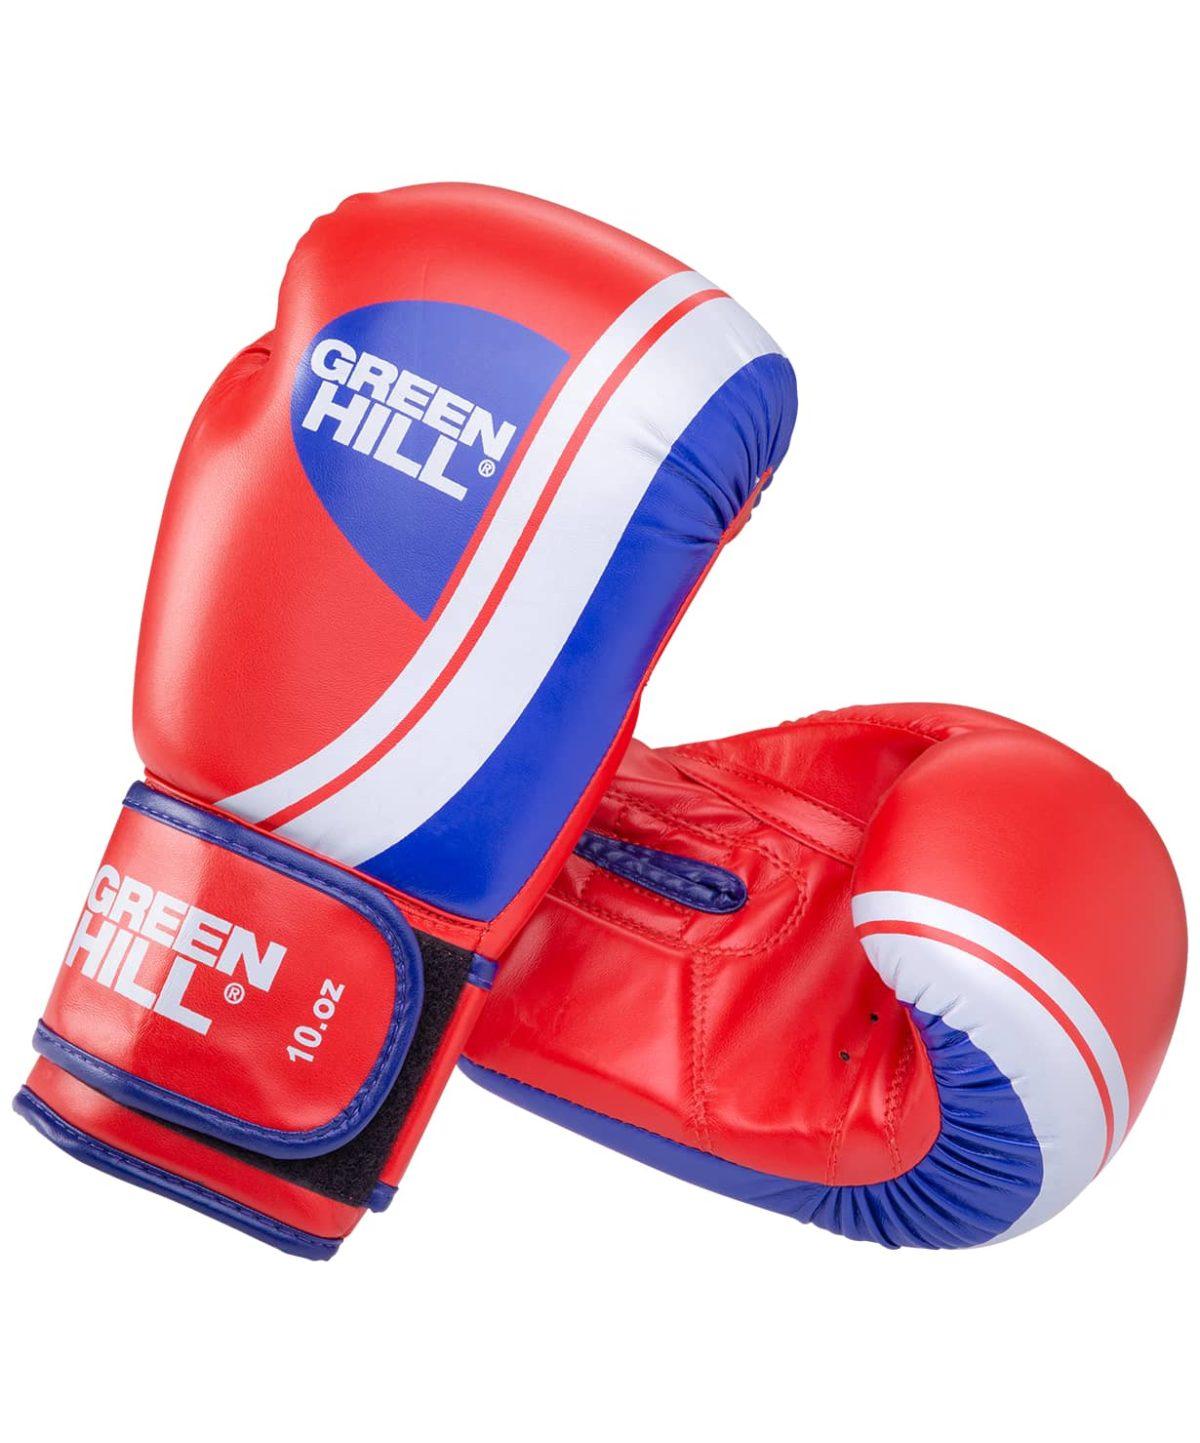 GREEN HILL Перчатки боксерские 8 oz Knockout  BGK-2266: красный - 1